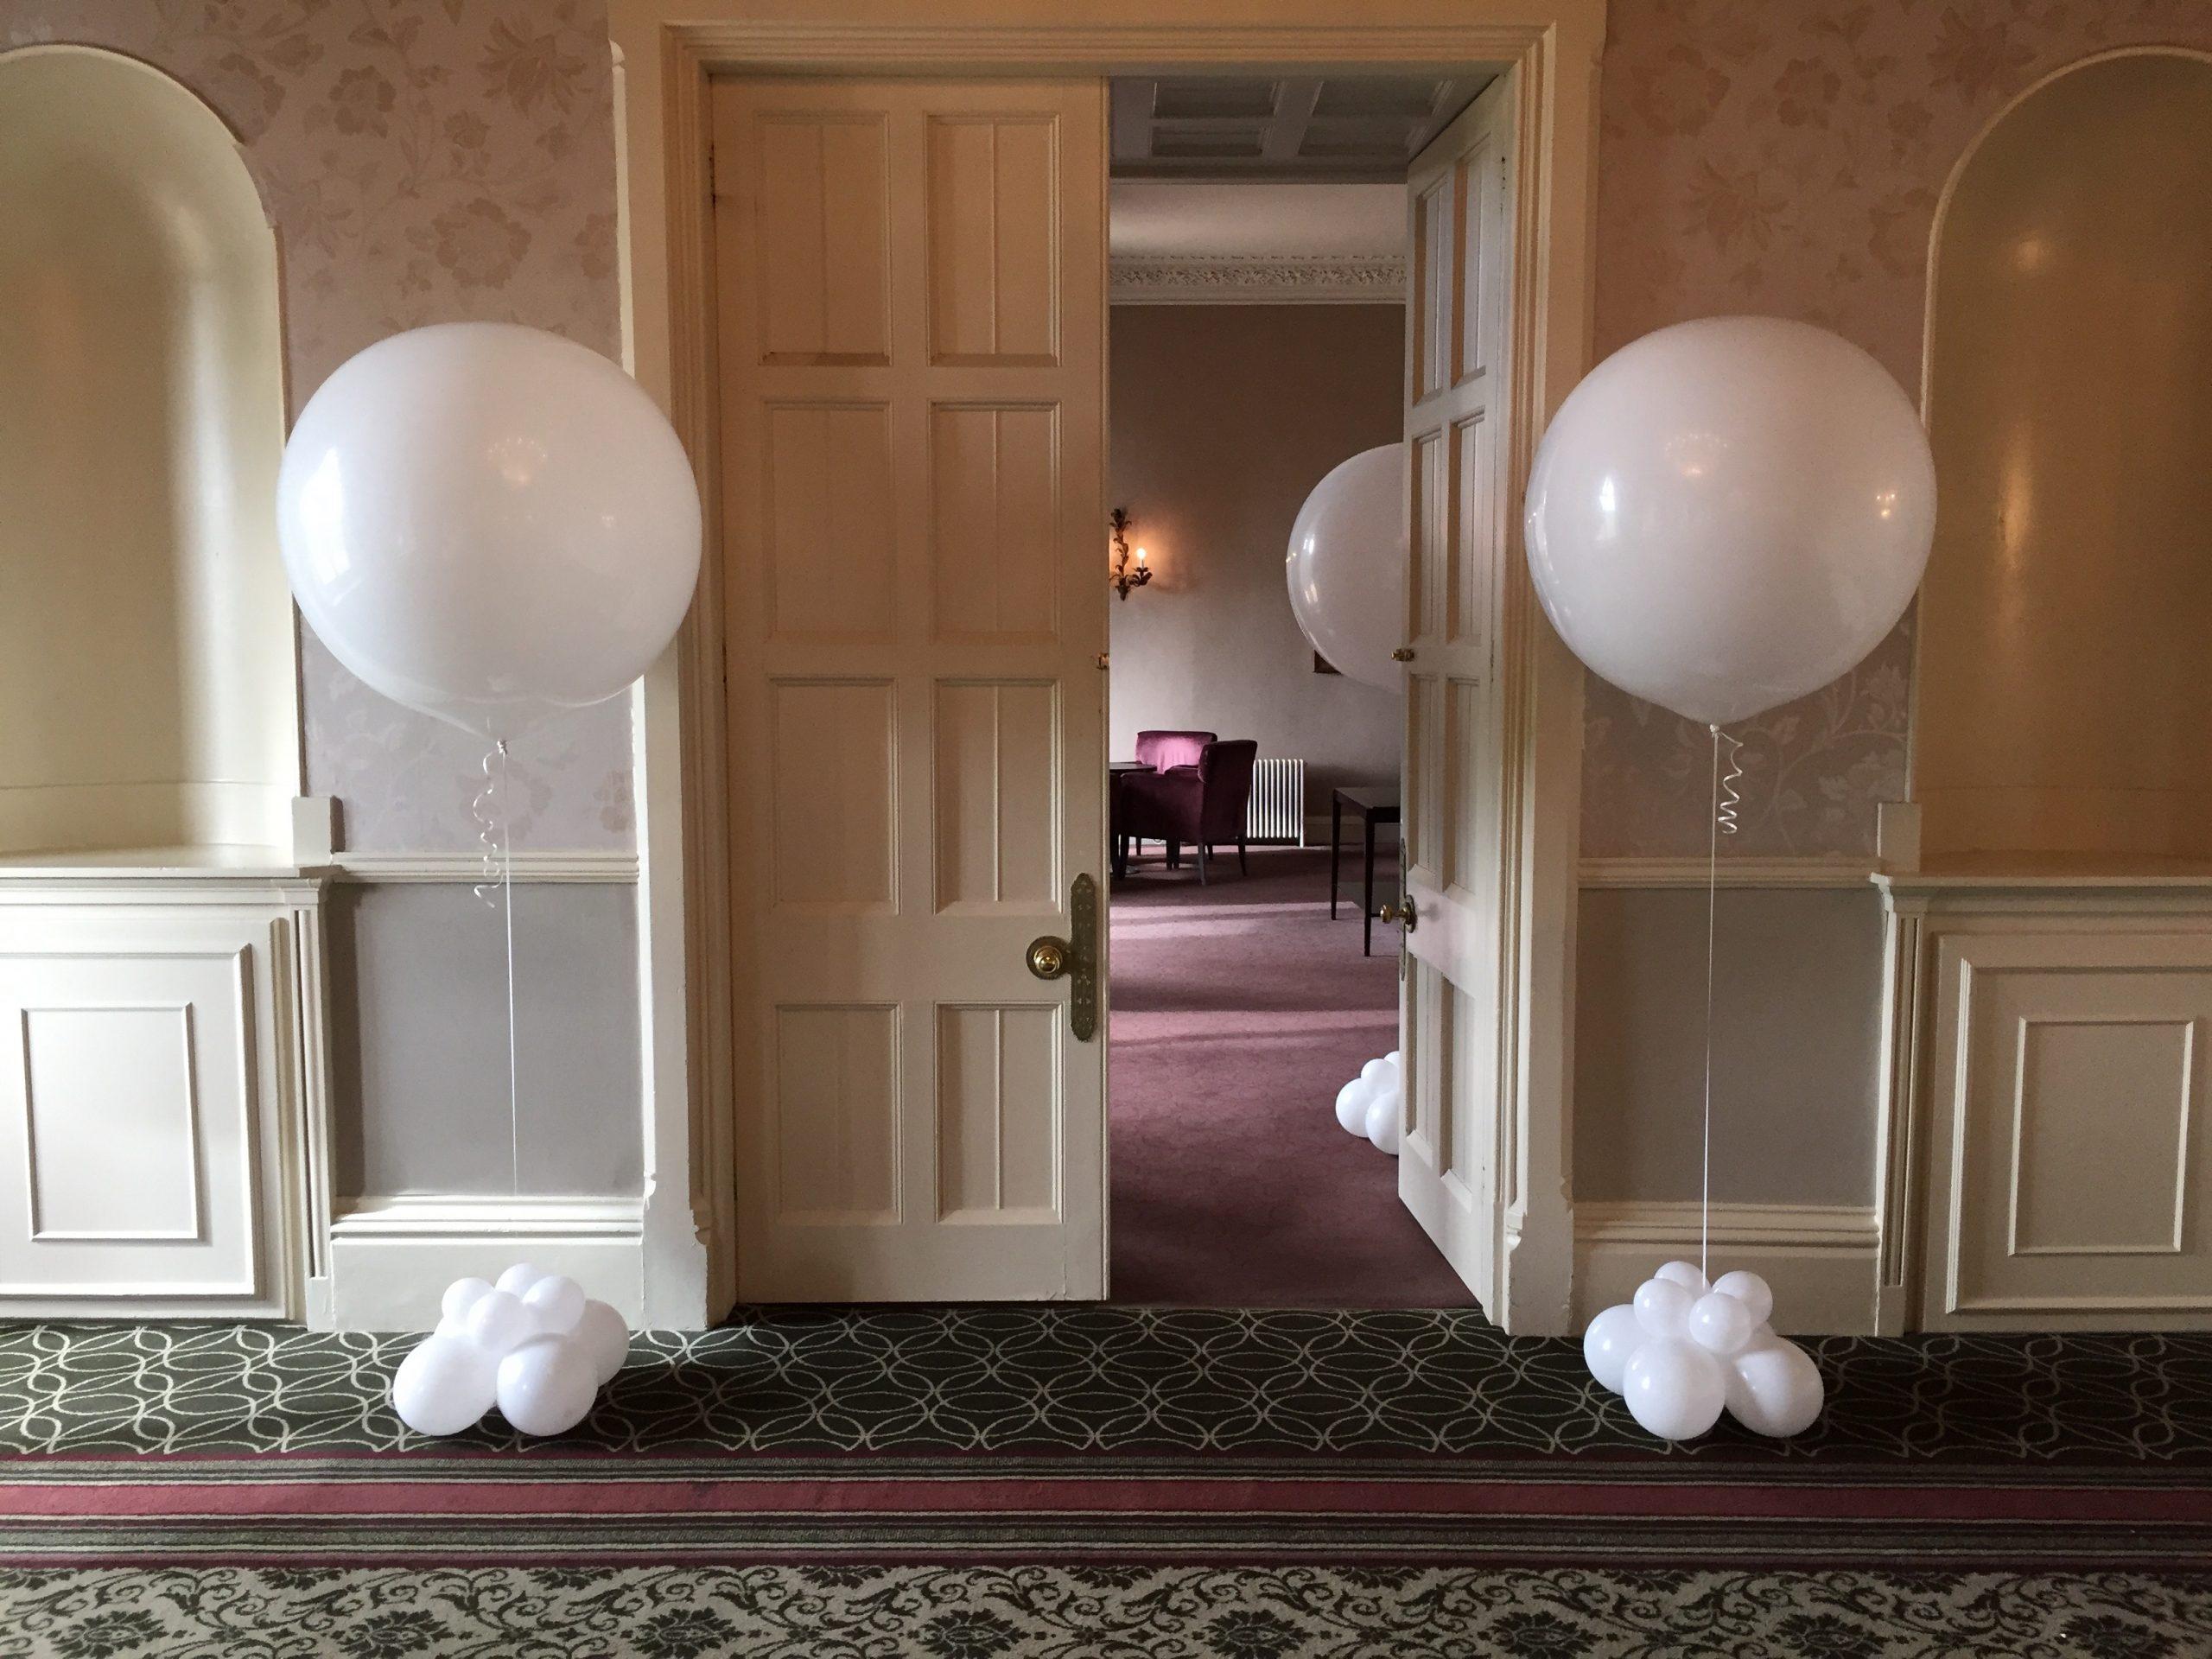 3ft Balloons at entrance